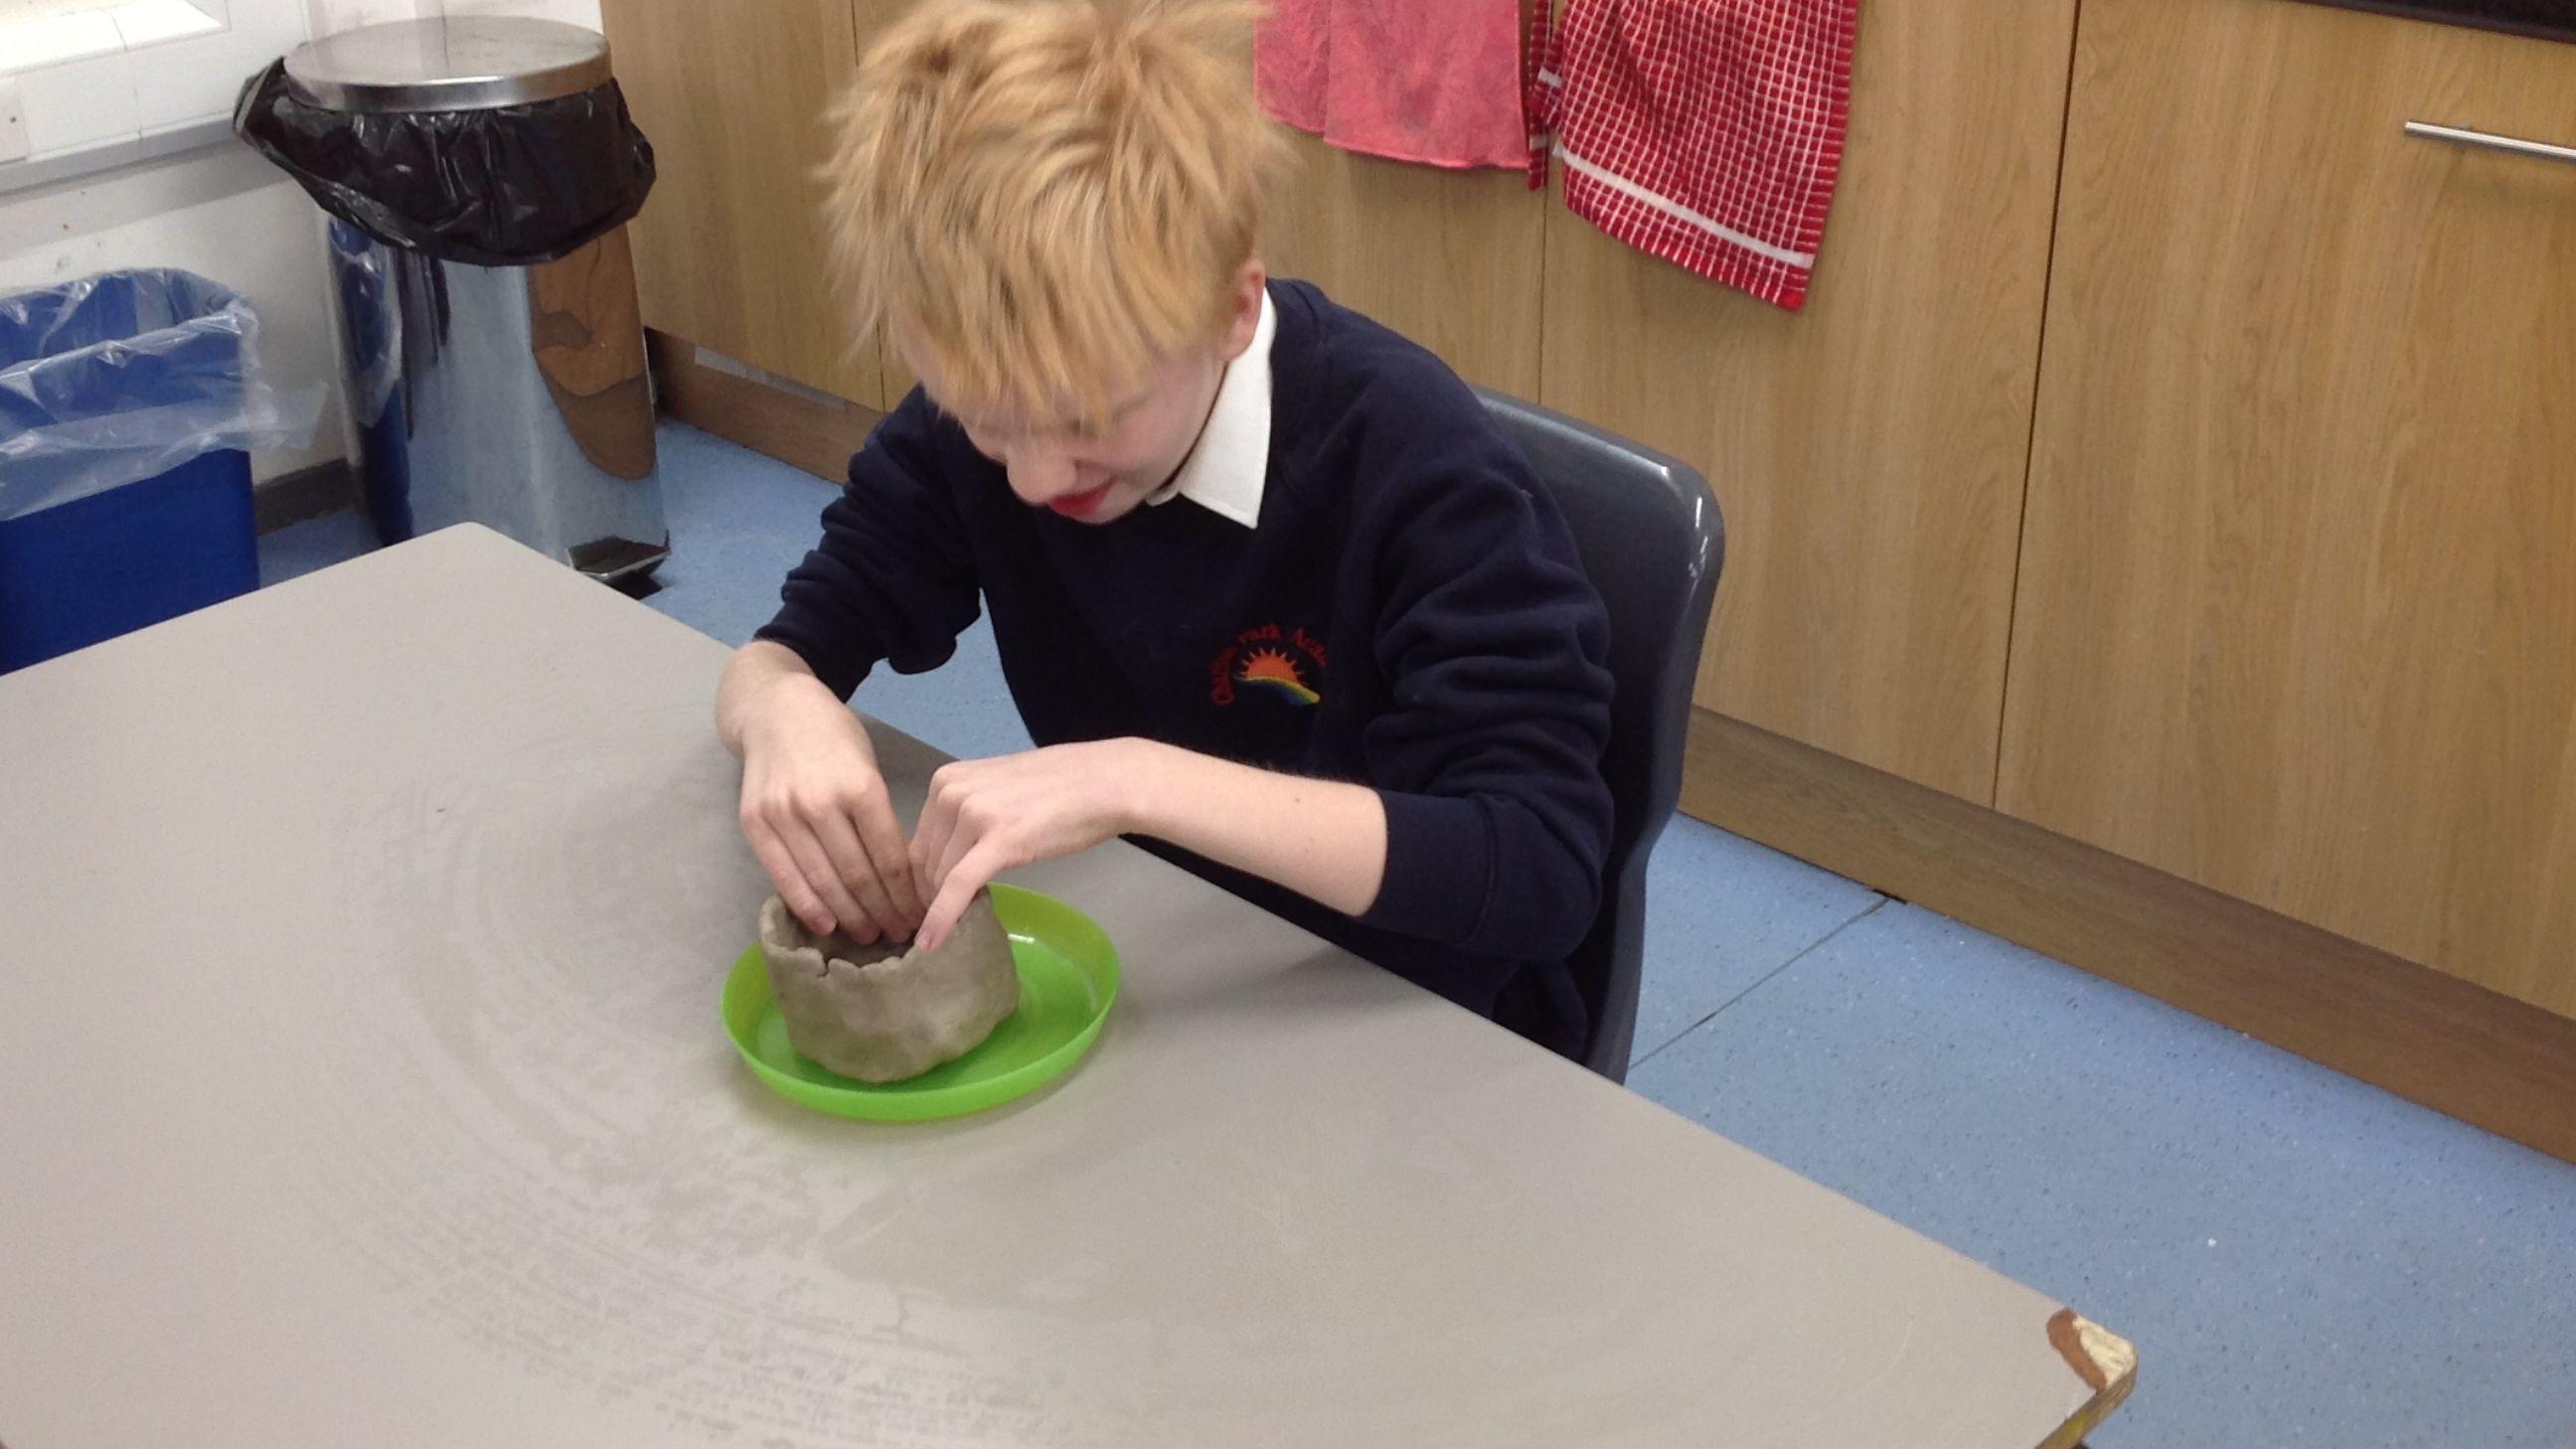 Young boy at desk making a clay pot